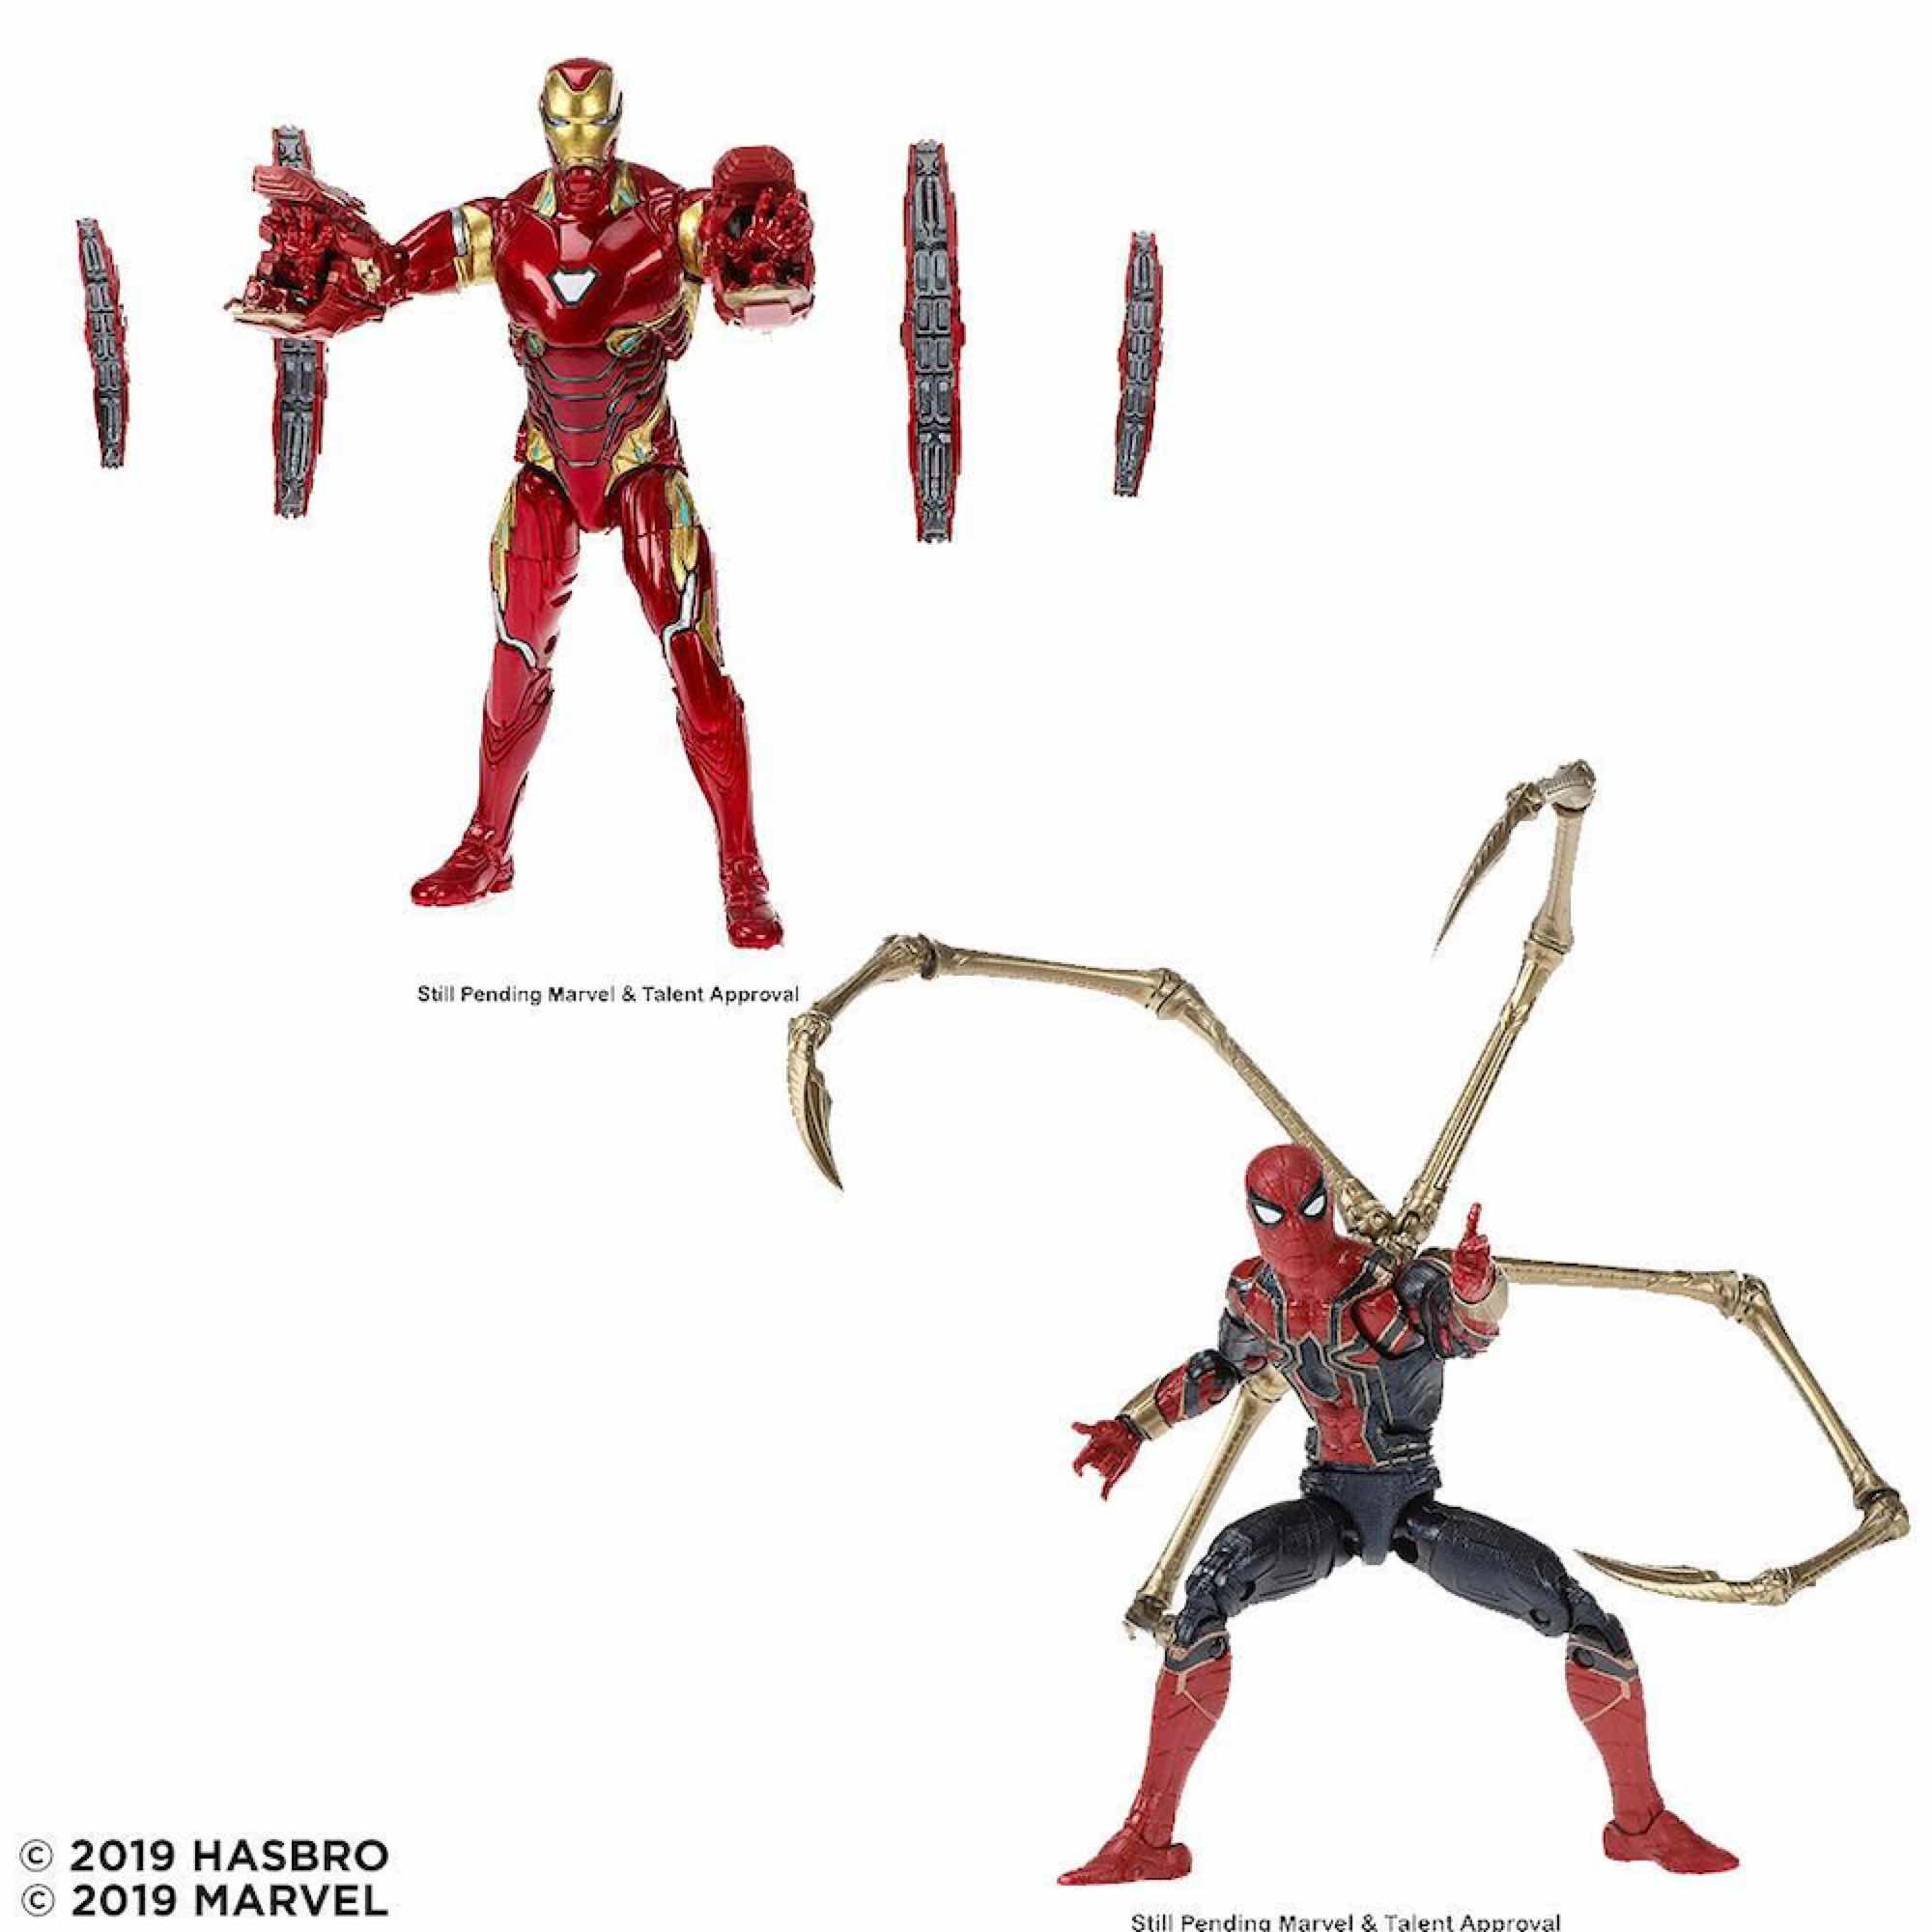 SET IRON SPIDER + IRON MAN FIGURA 15 CM MARVEL LEGENDS 80TH ANNIVERSARY E6341E48